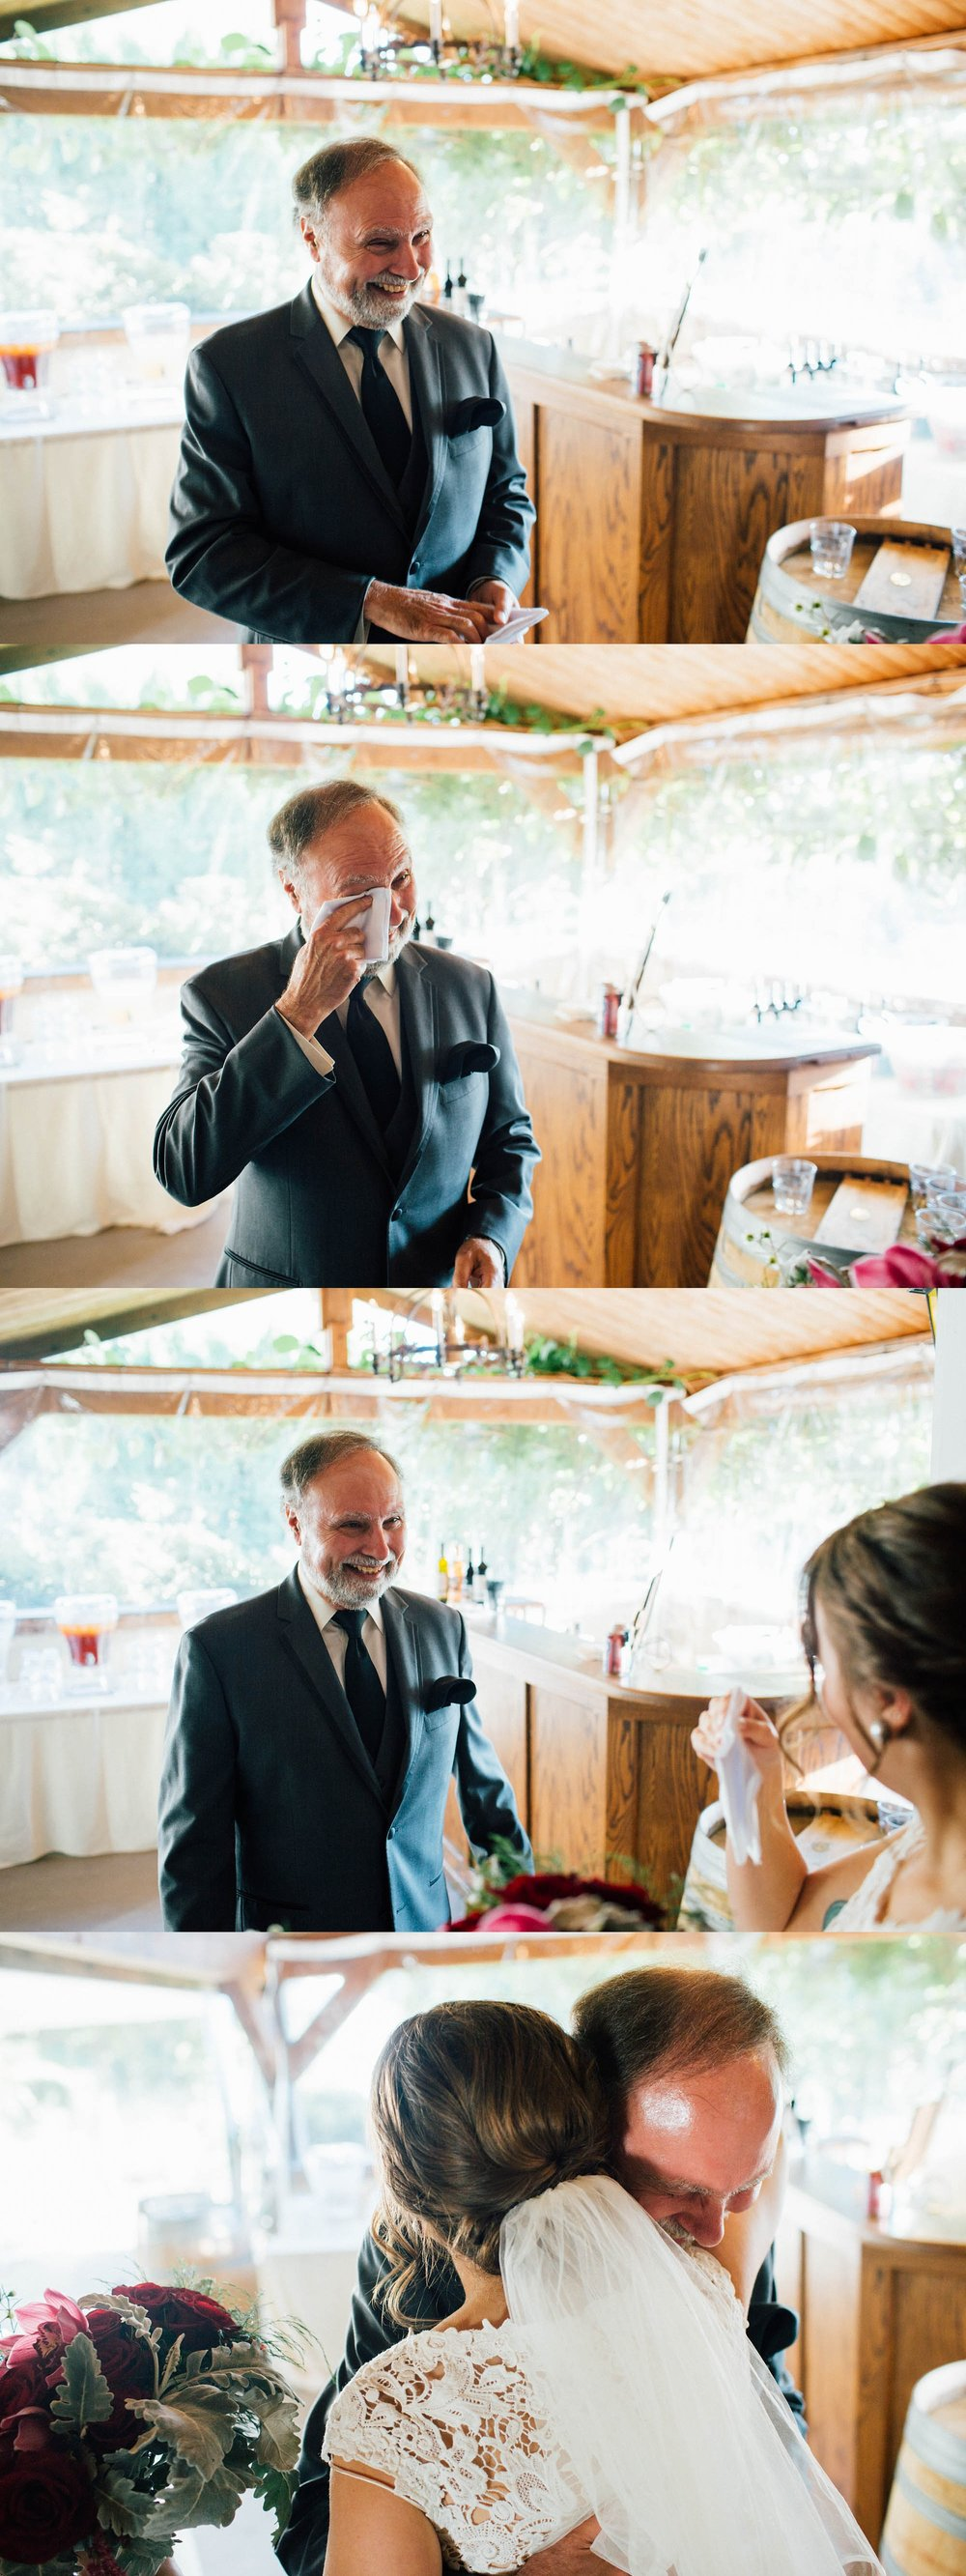 ashley_vos_seattle_ wedding_photographer_0190.jpg